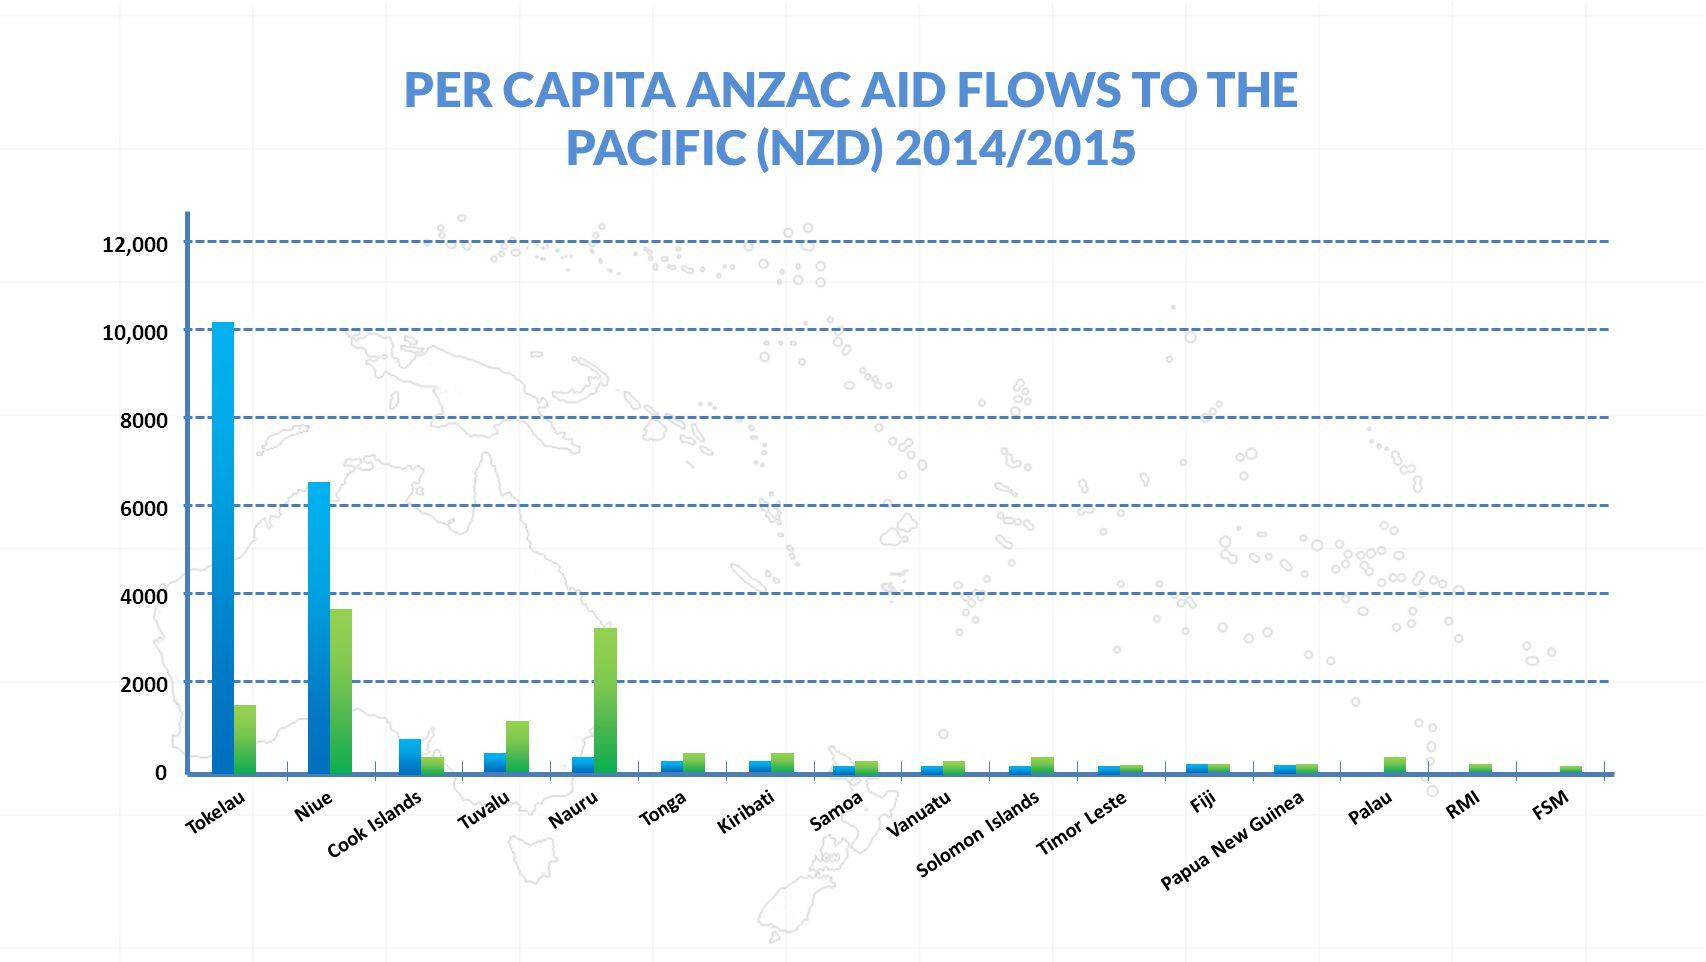 PER CAPITA ANZAC AID FLOWS TO THE PACIFIC (NZD) 2014/2015 TokelauNiueCook IslandsTuvaluNauruTongaKiribatiSamoaVanuatuSolomon IslandsTimor LesteFijiPap